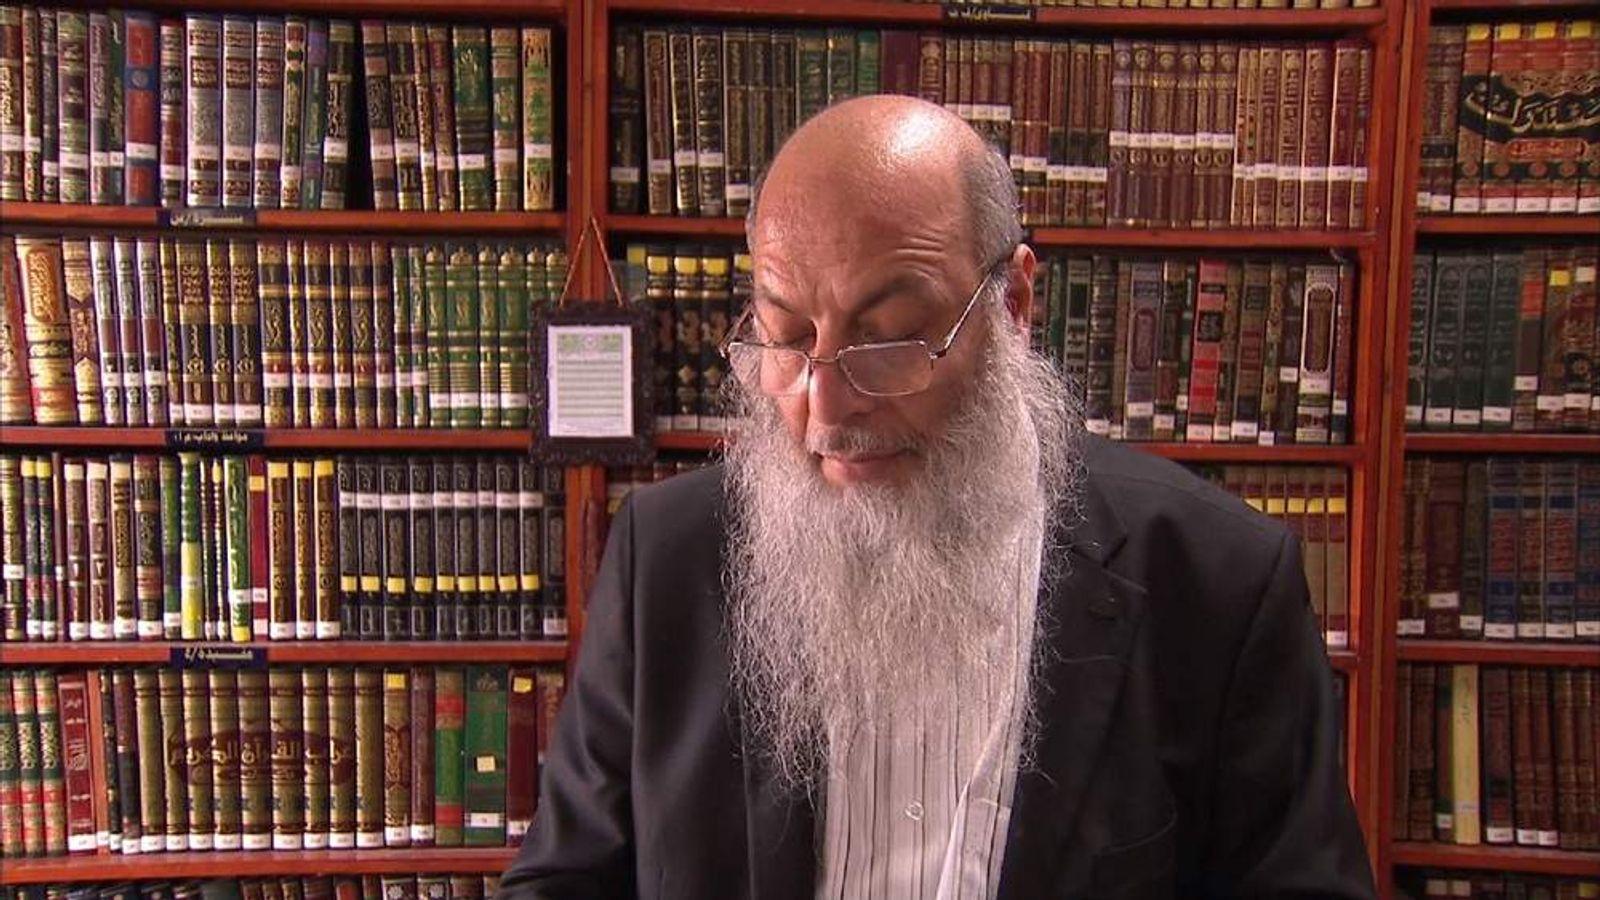 Cardiff Mosque trustee Barak Albayaty